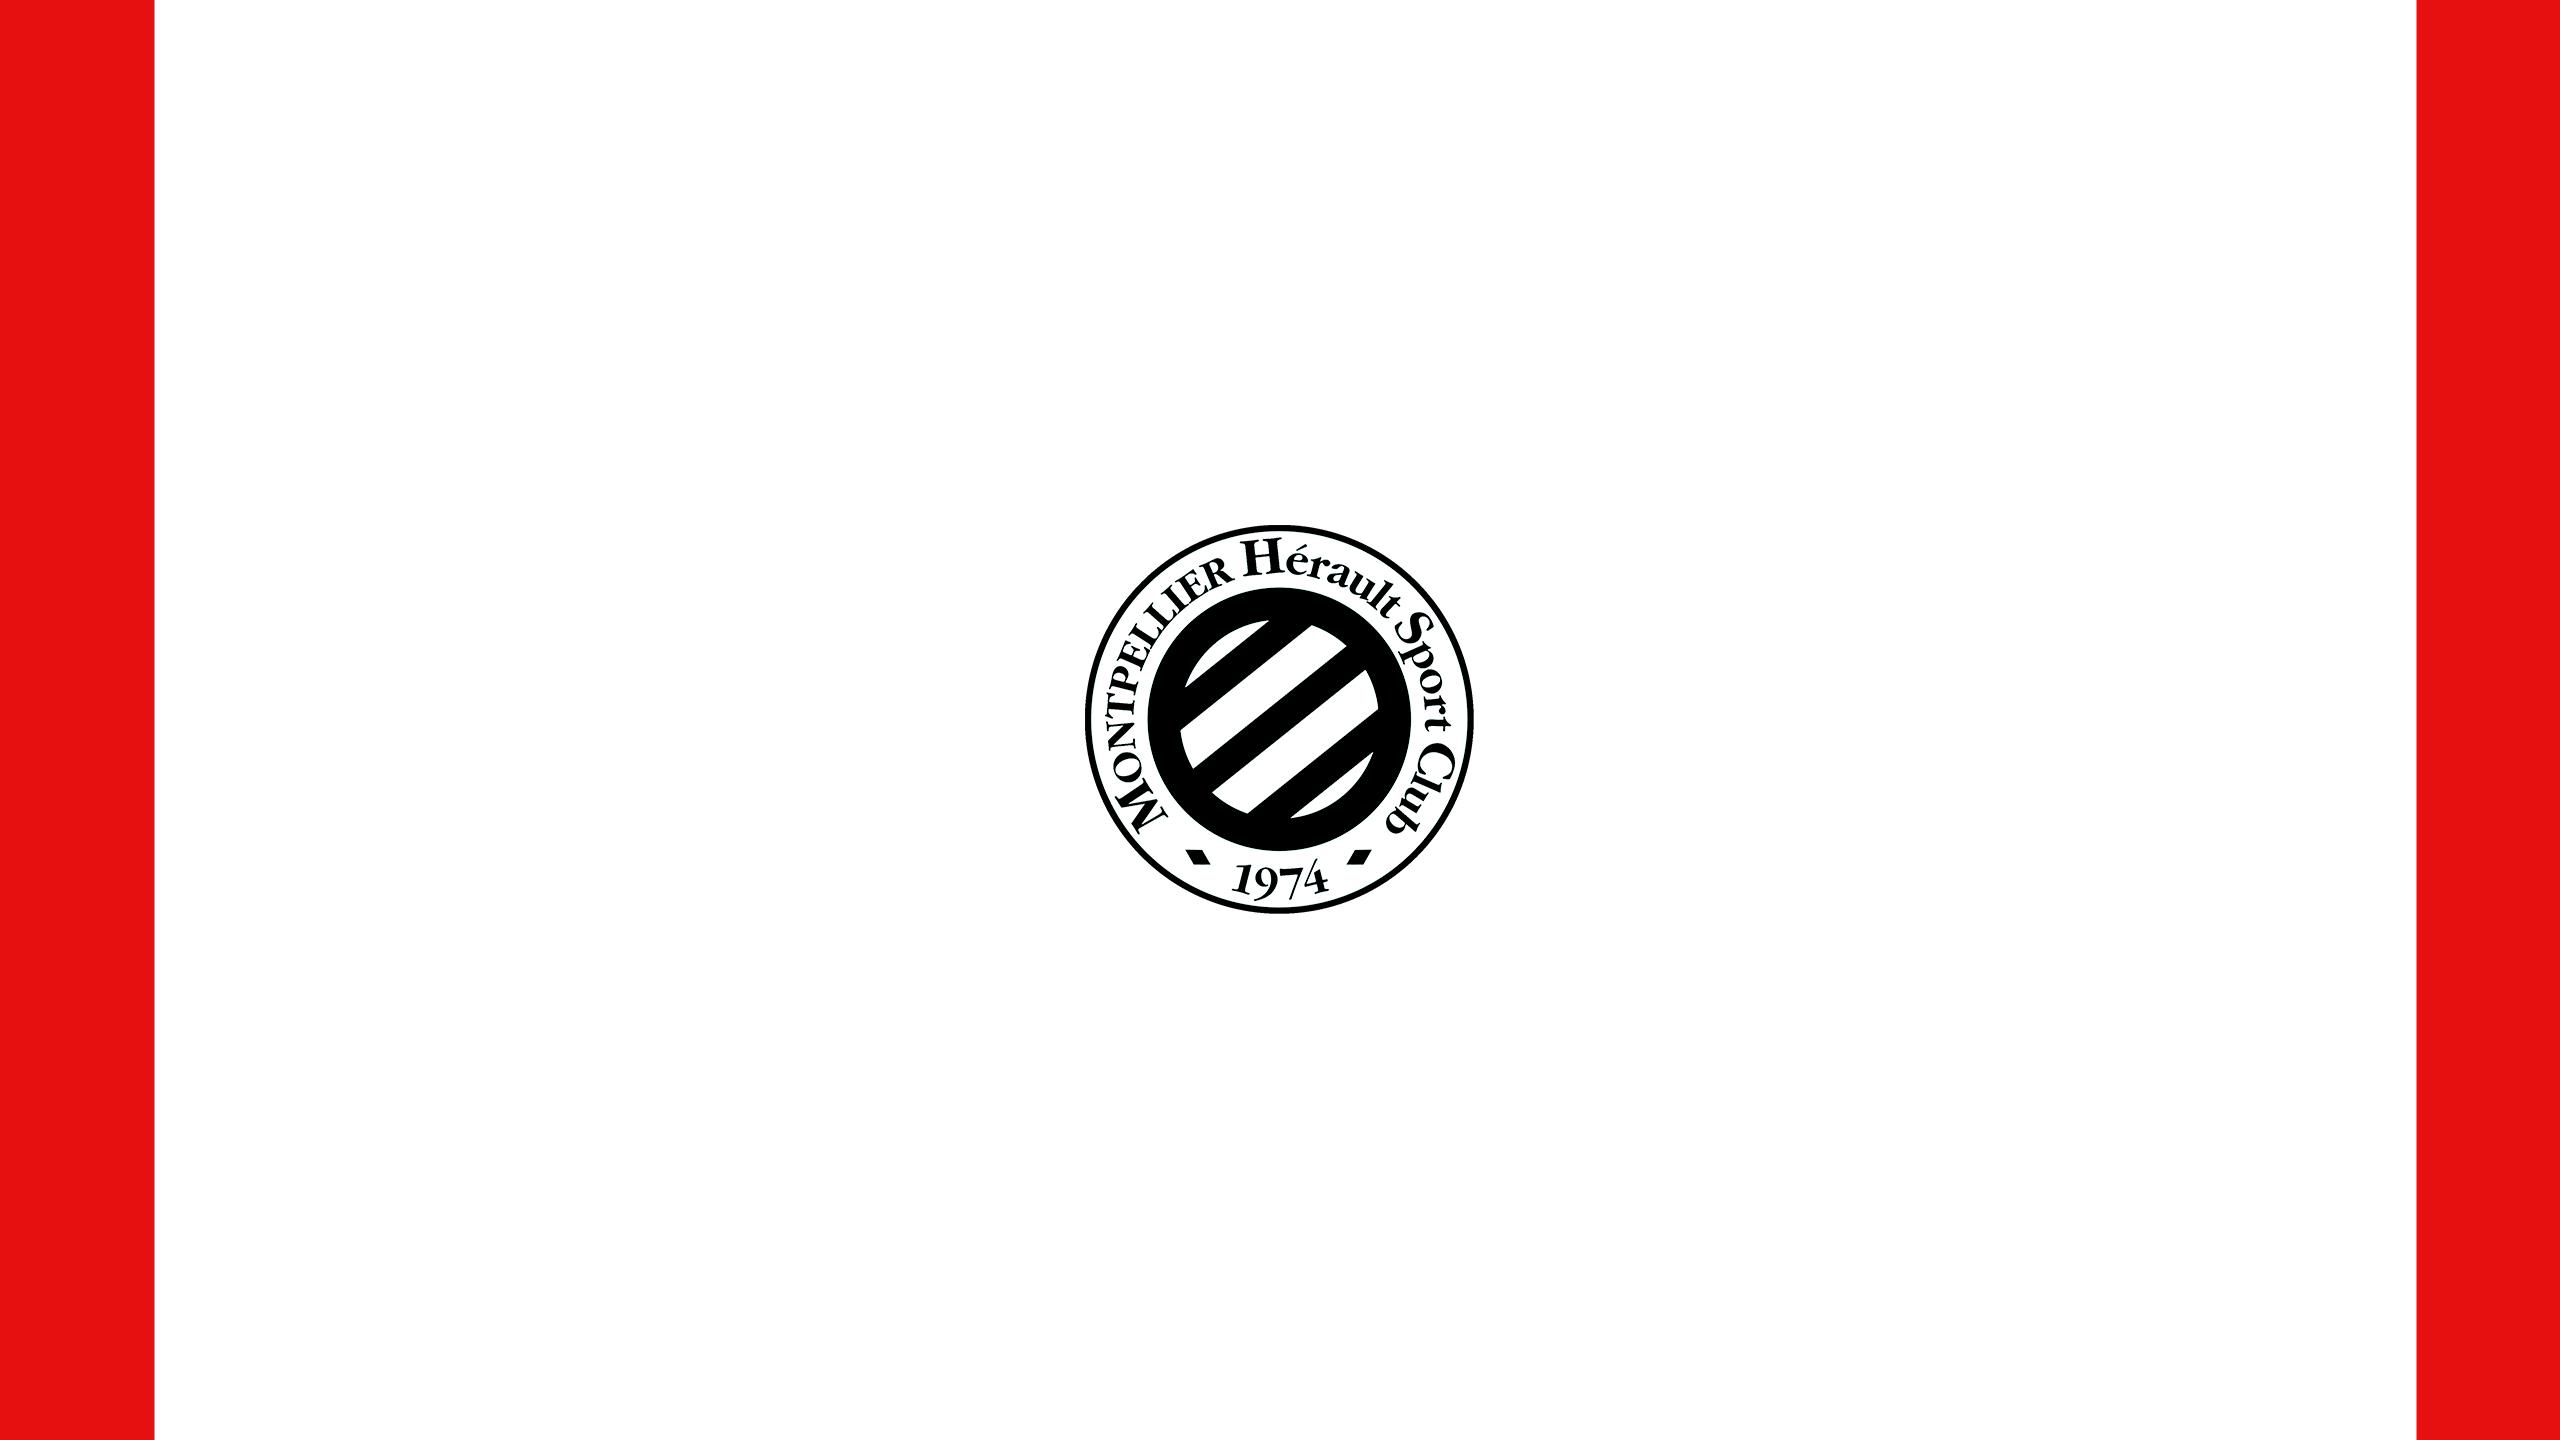 Montpellier Herault SC (Away)